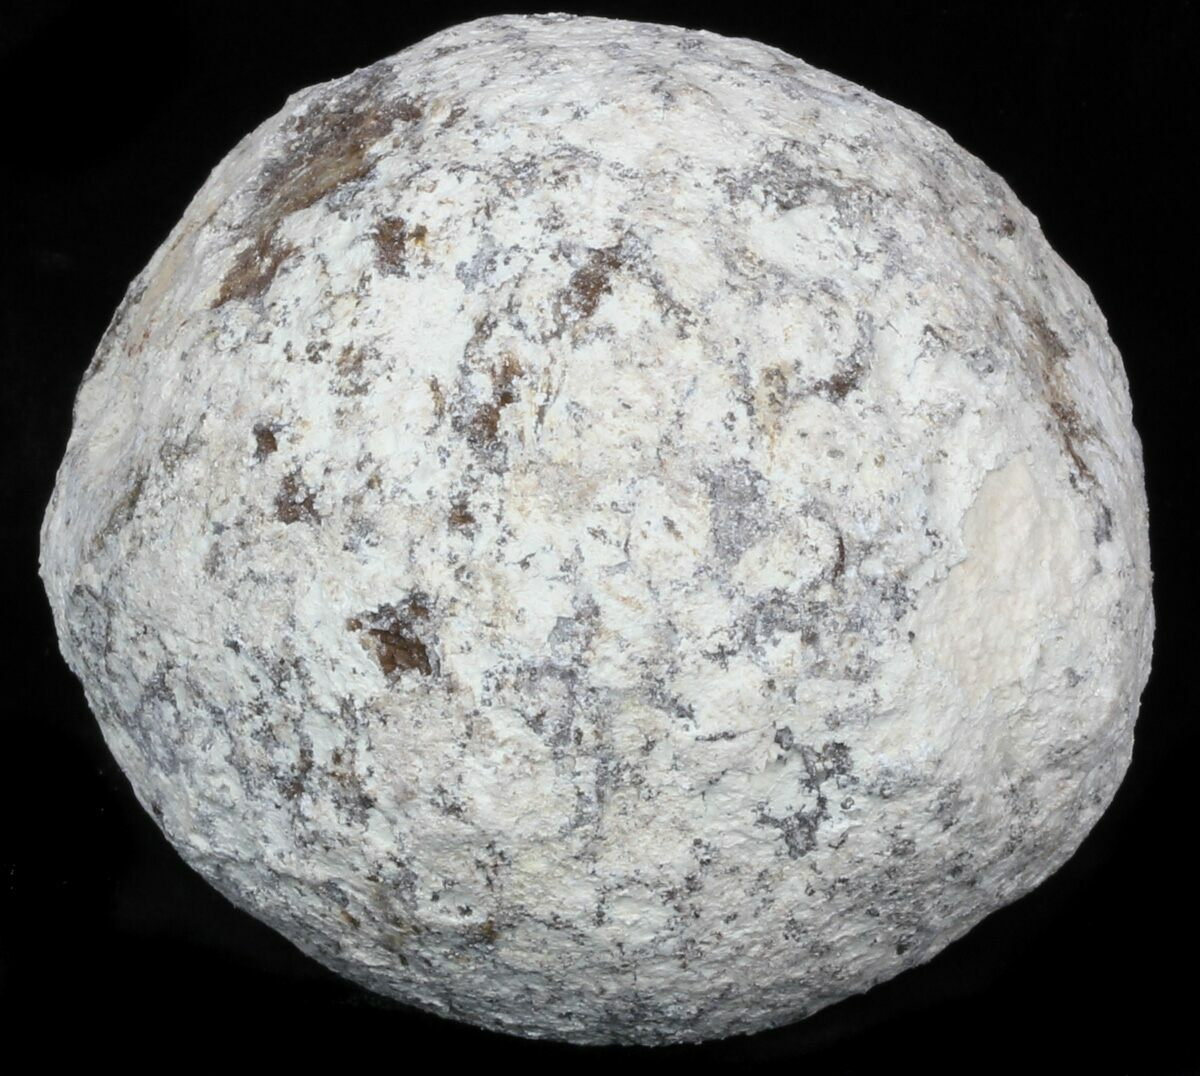 Whole/Unbroken Geodes For Sale - FossilEra.com